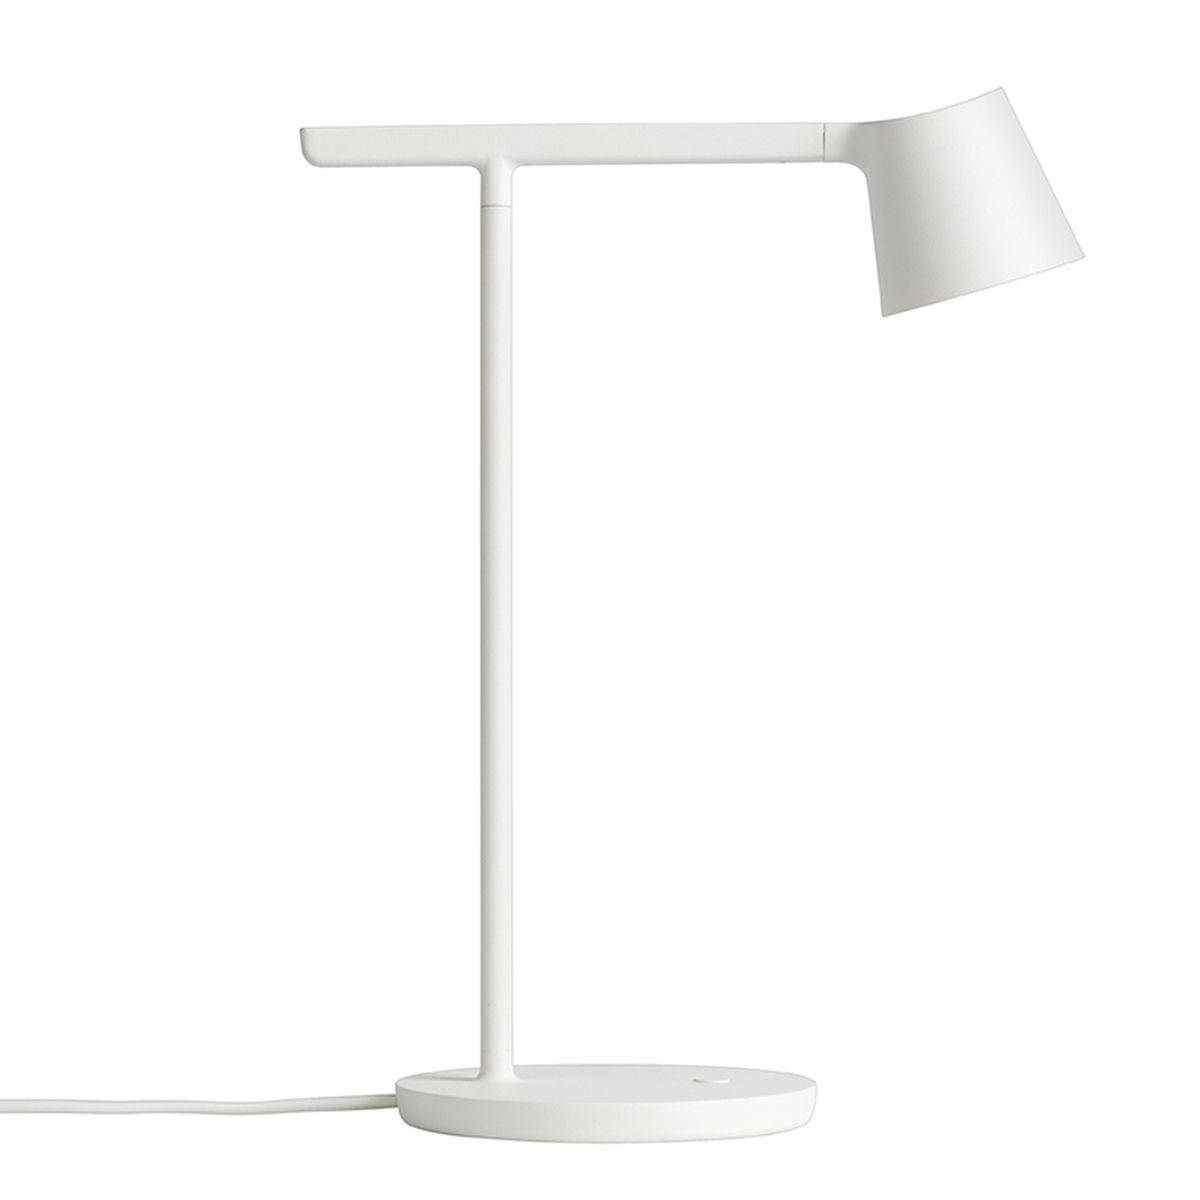 Muuto Tip Table Lamp White Lamp Adjustable Lighting Table Lamp